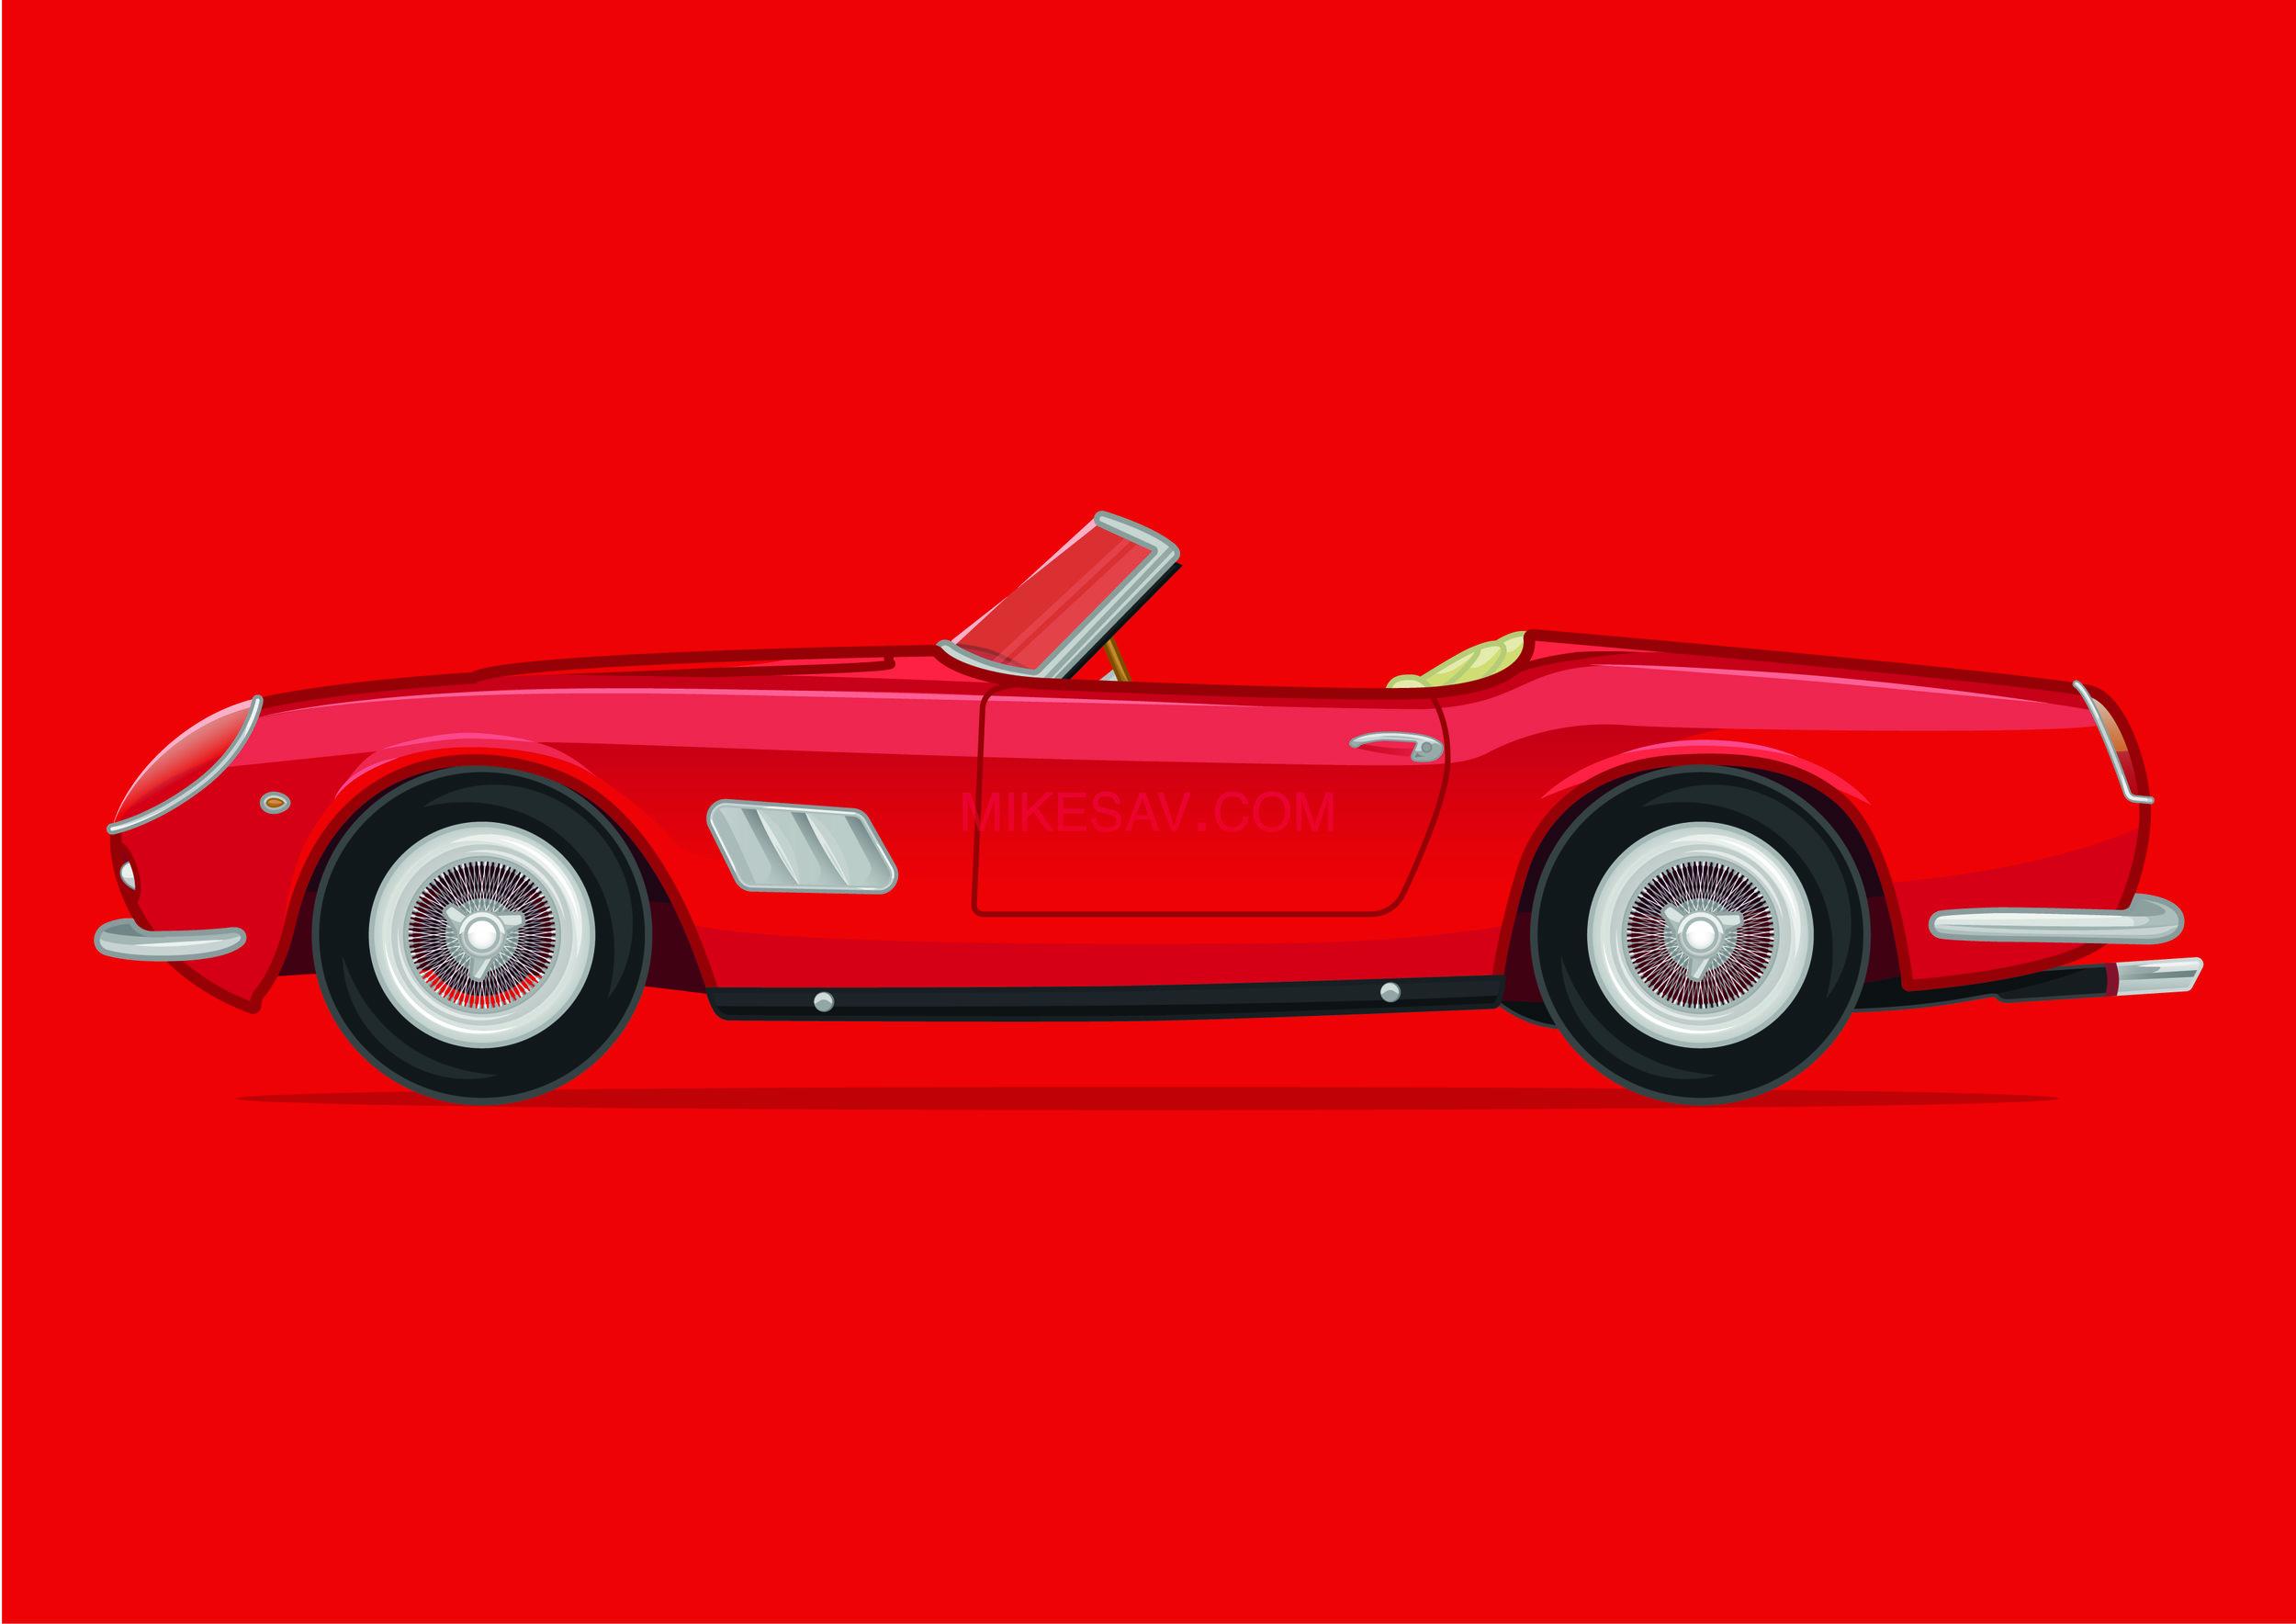 Ferrari 250GT California / Ferris Bueller's Day Off (1986) / Director: John Hughes